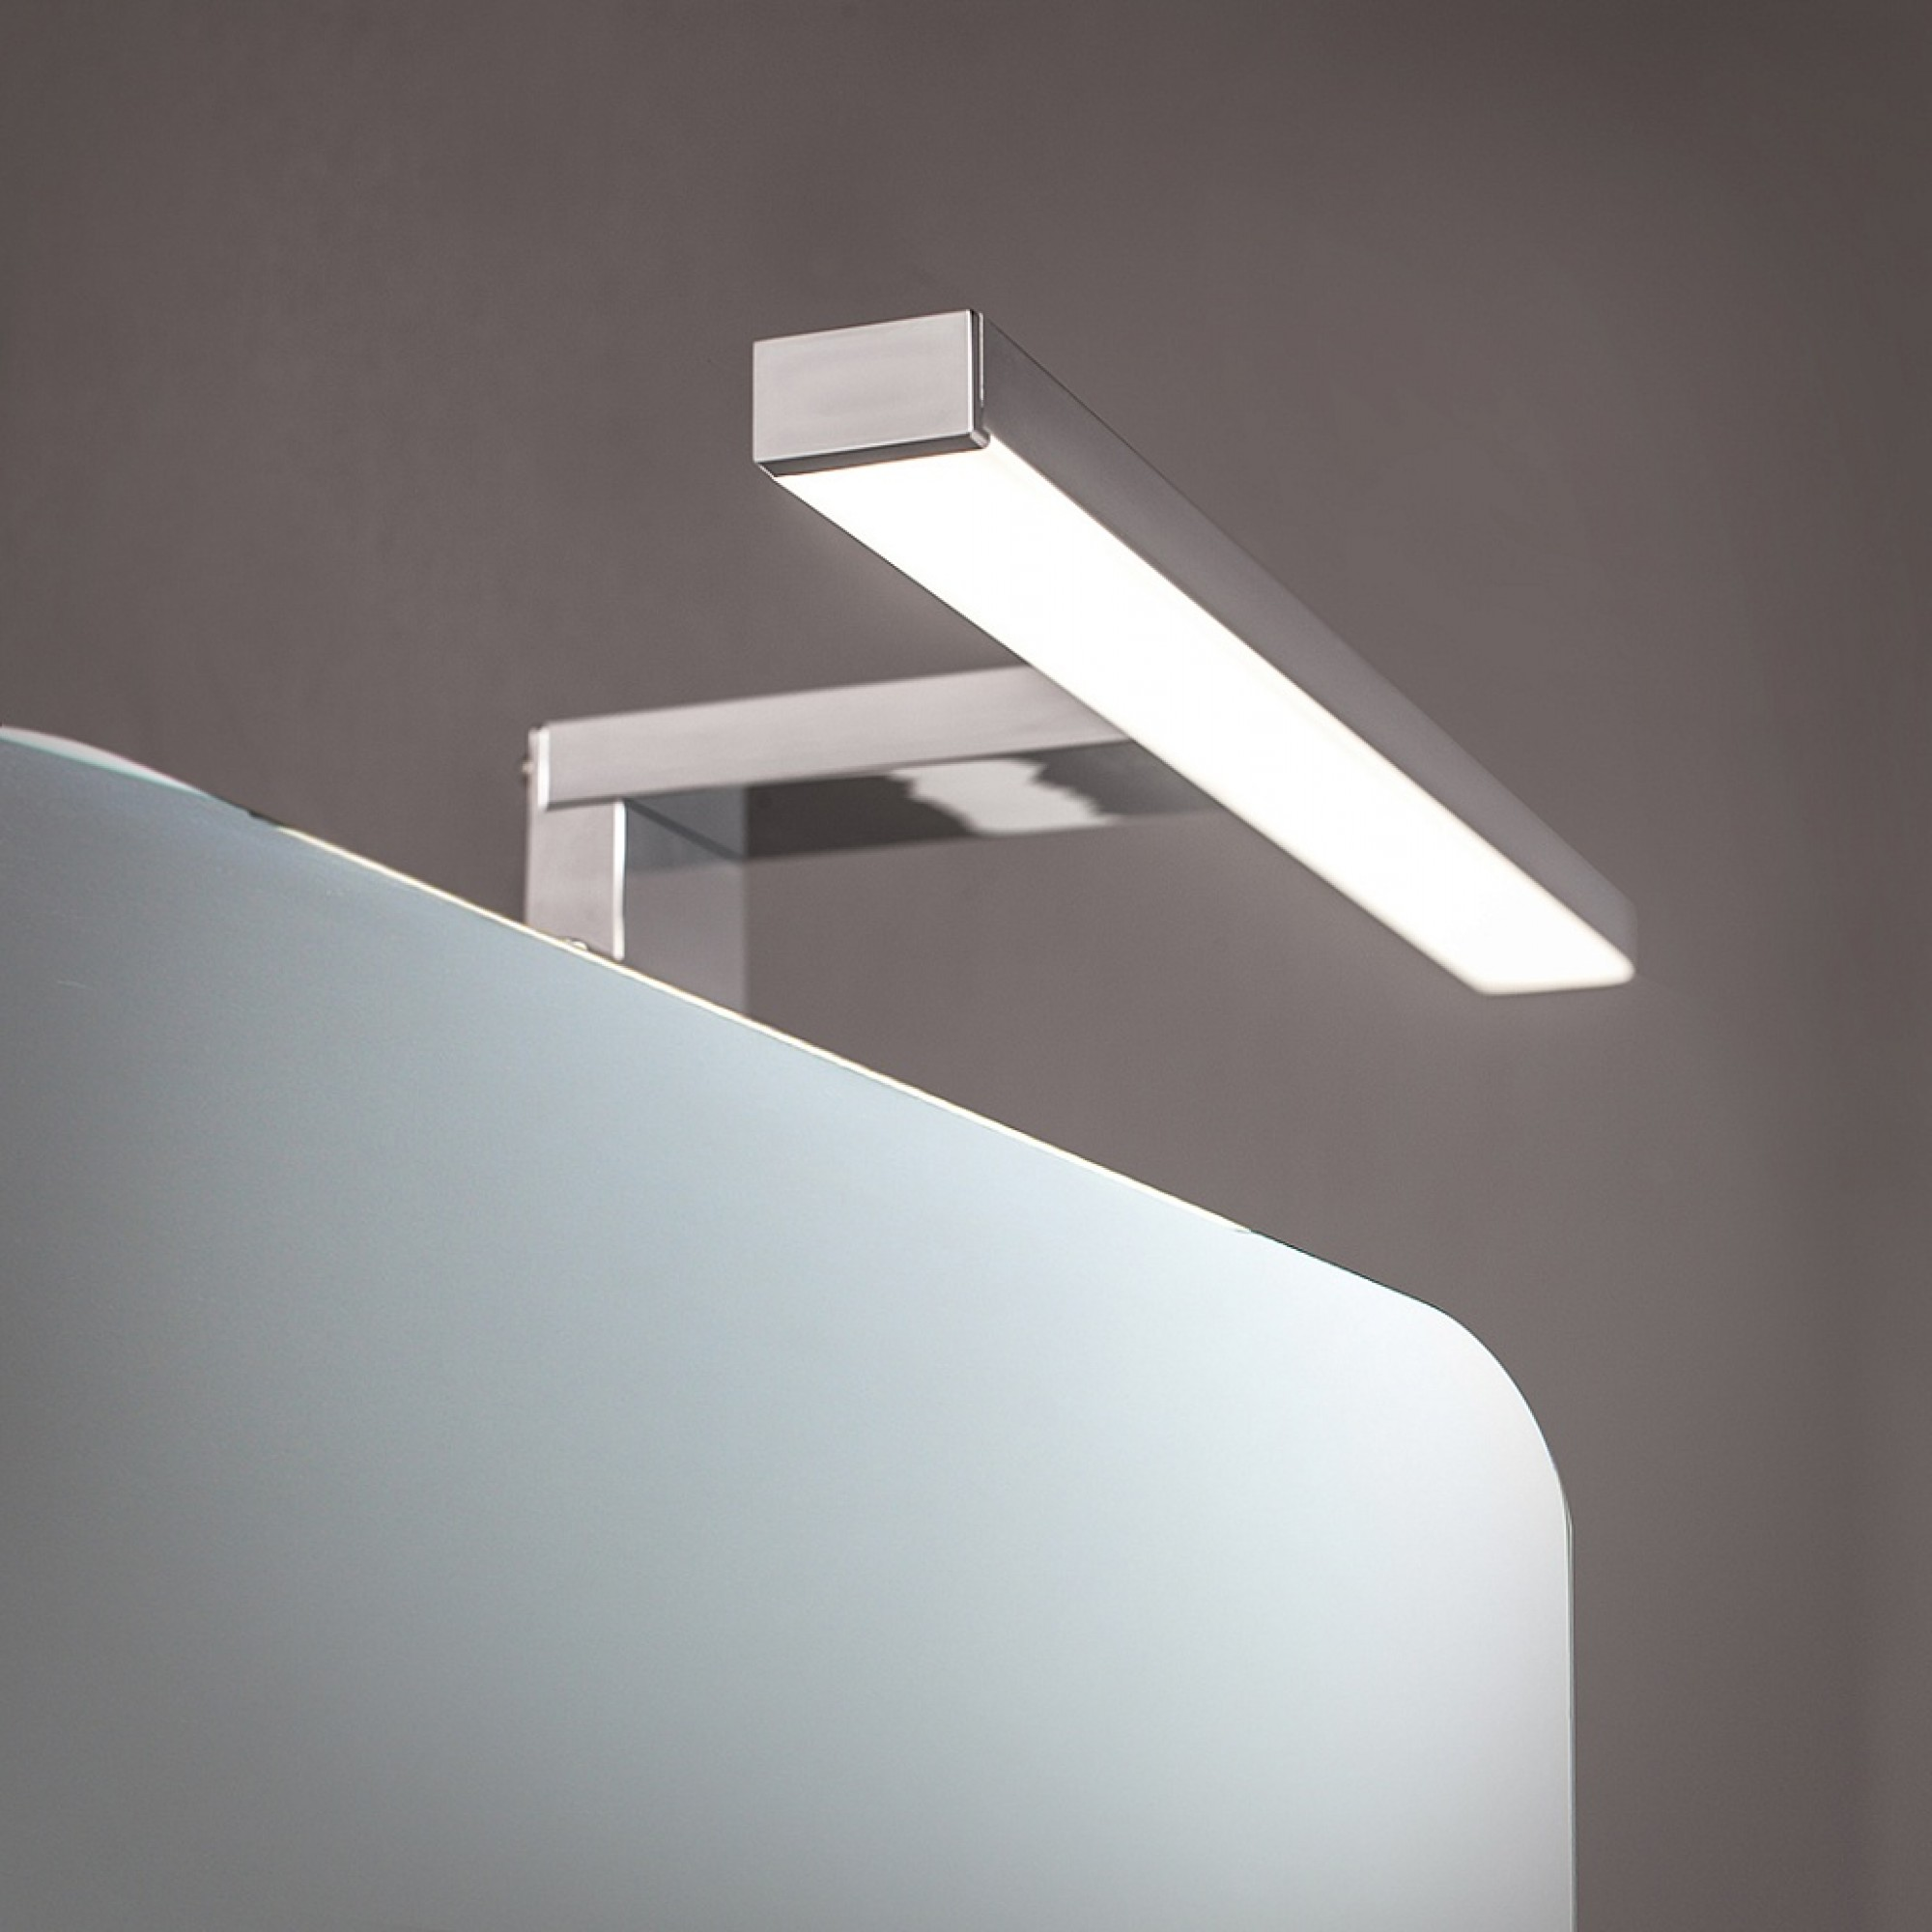 Светильник LED FAGUS +2 600 руб.